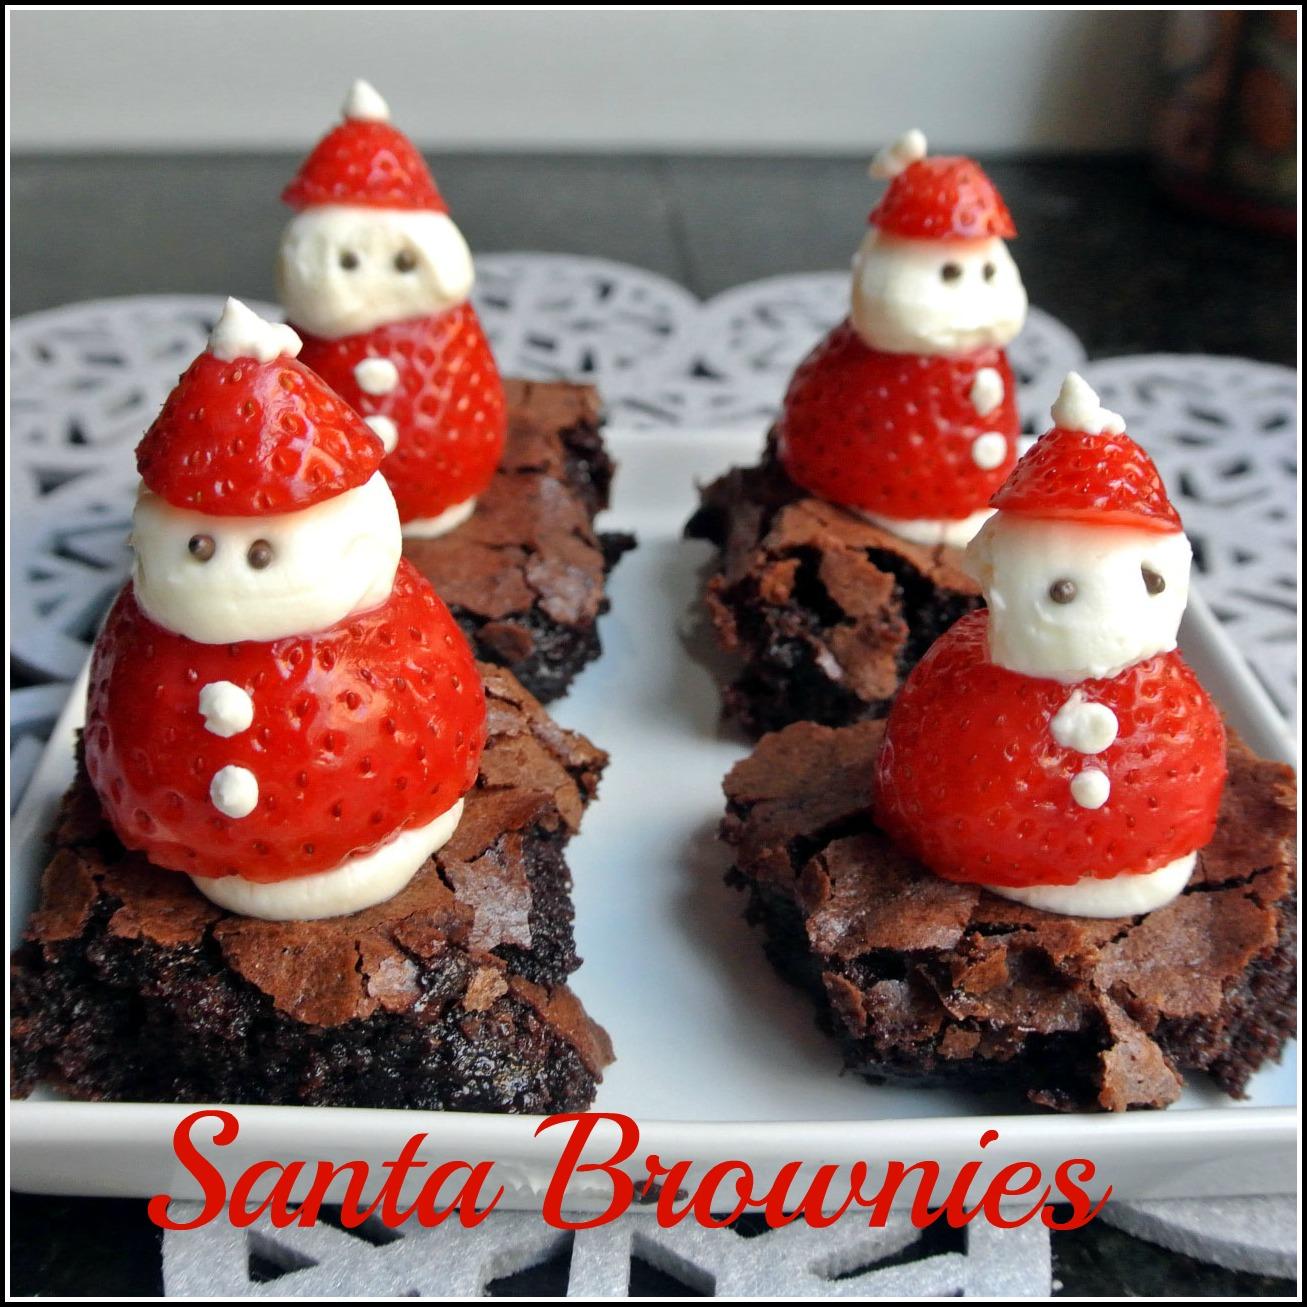 Mom, What's For Dinner?: Santa Brownies